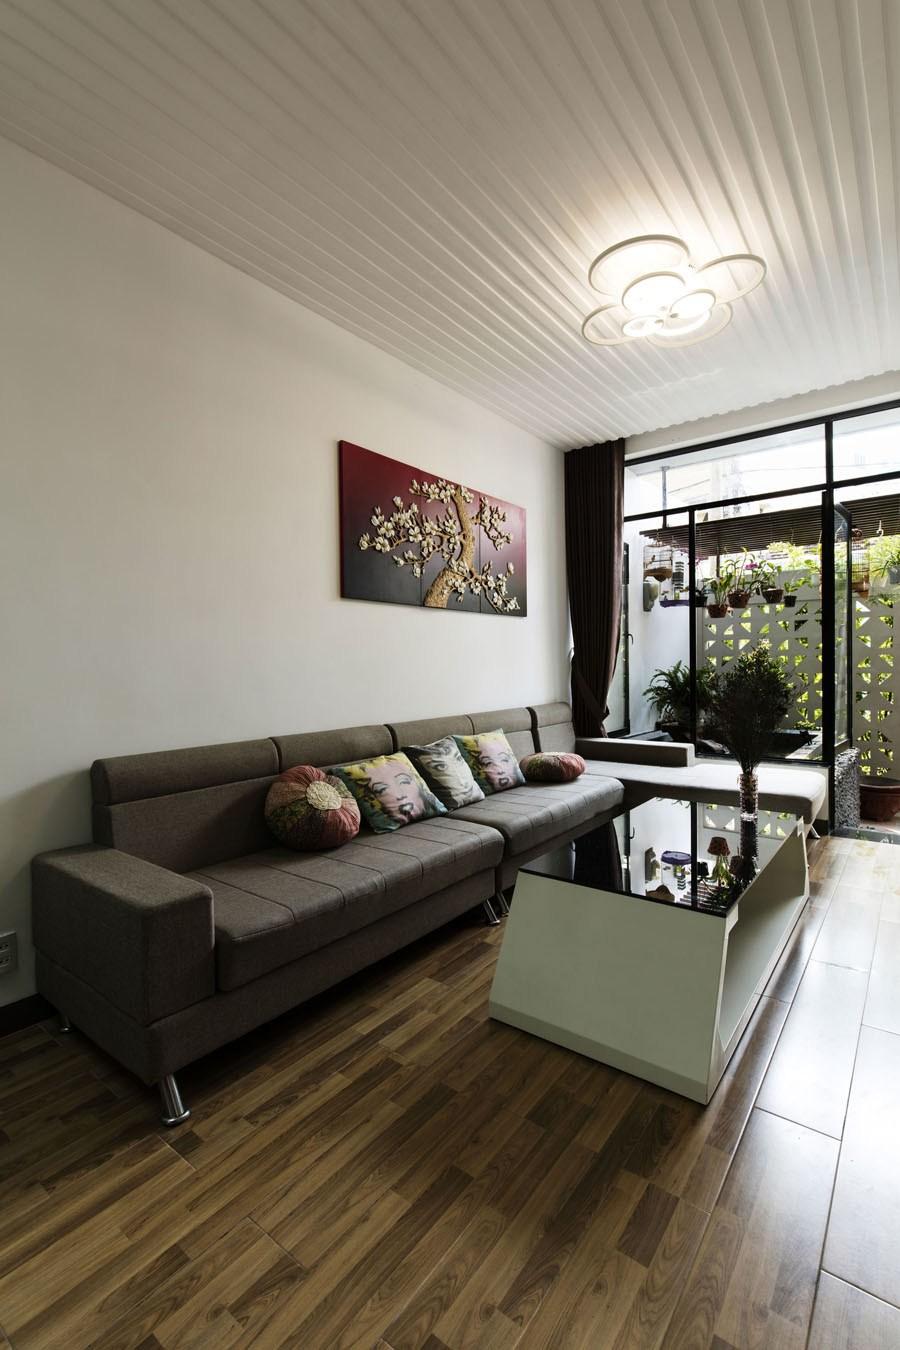 22house-kienviet-net-2-living-room-1534290345402409745430.jpg